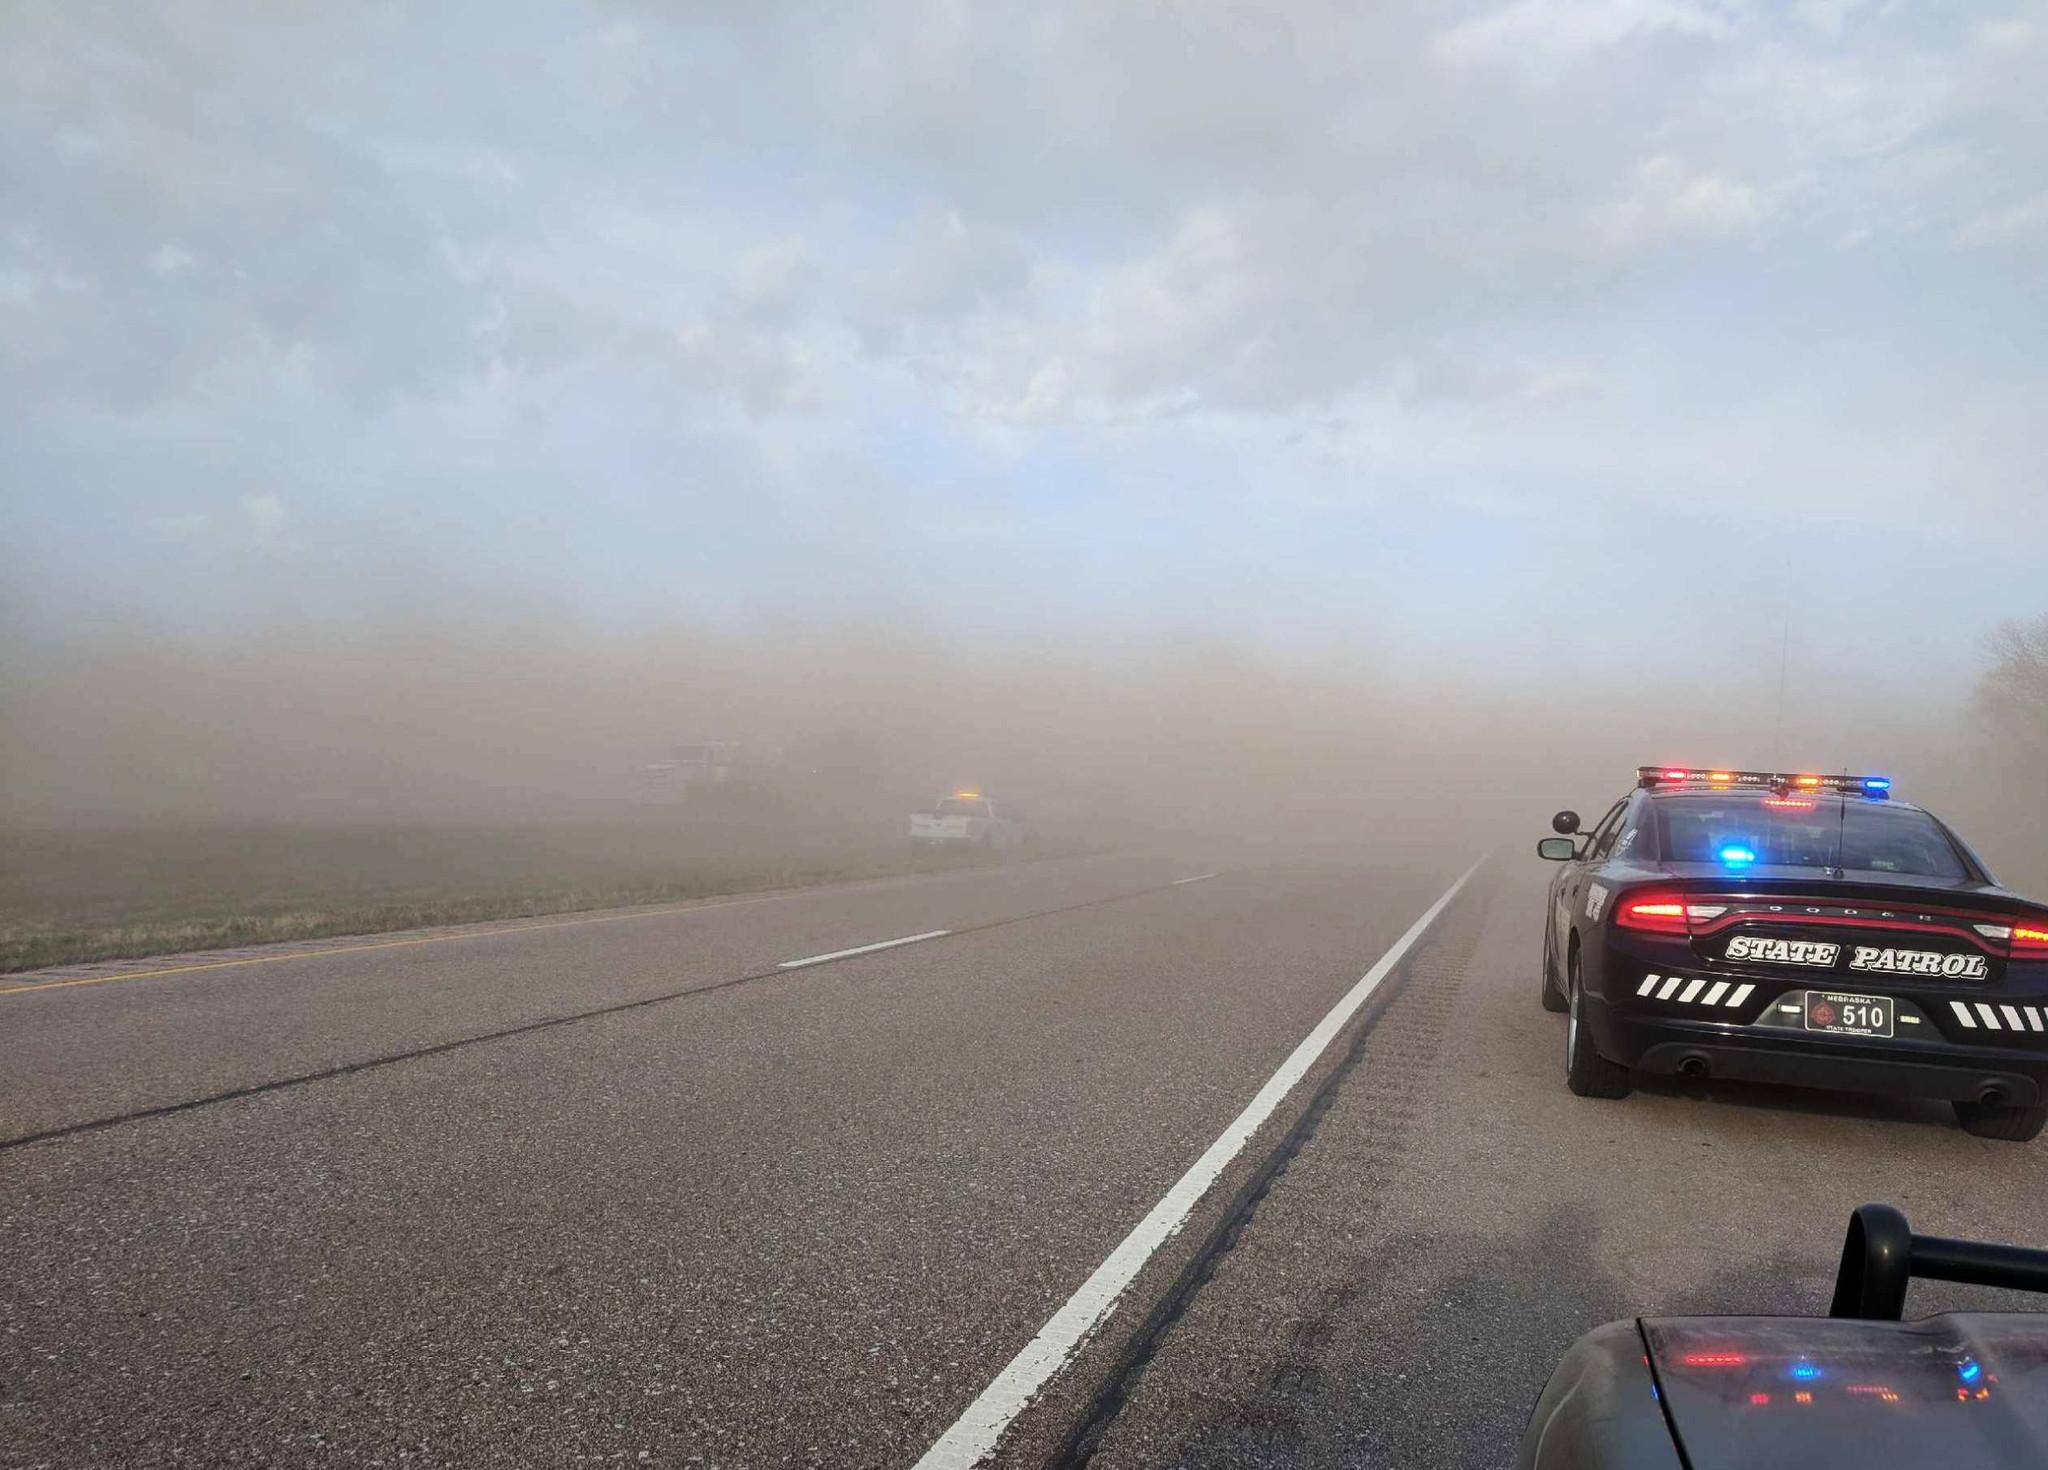 Nebraska Dust Storm Triggers 29 Vehicle Crash Killing 1